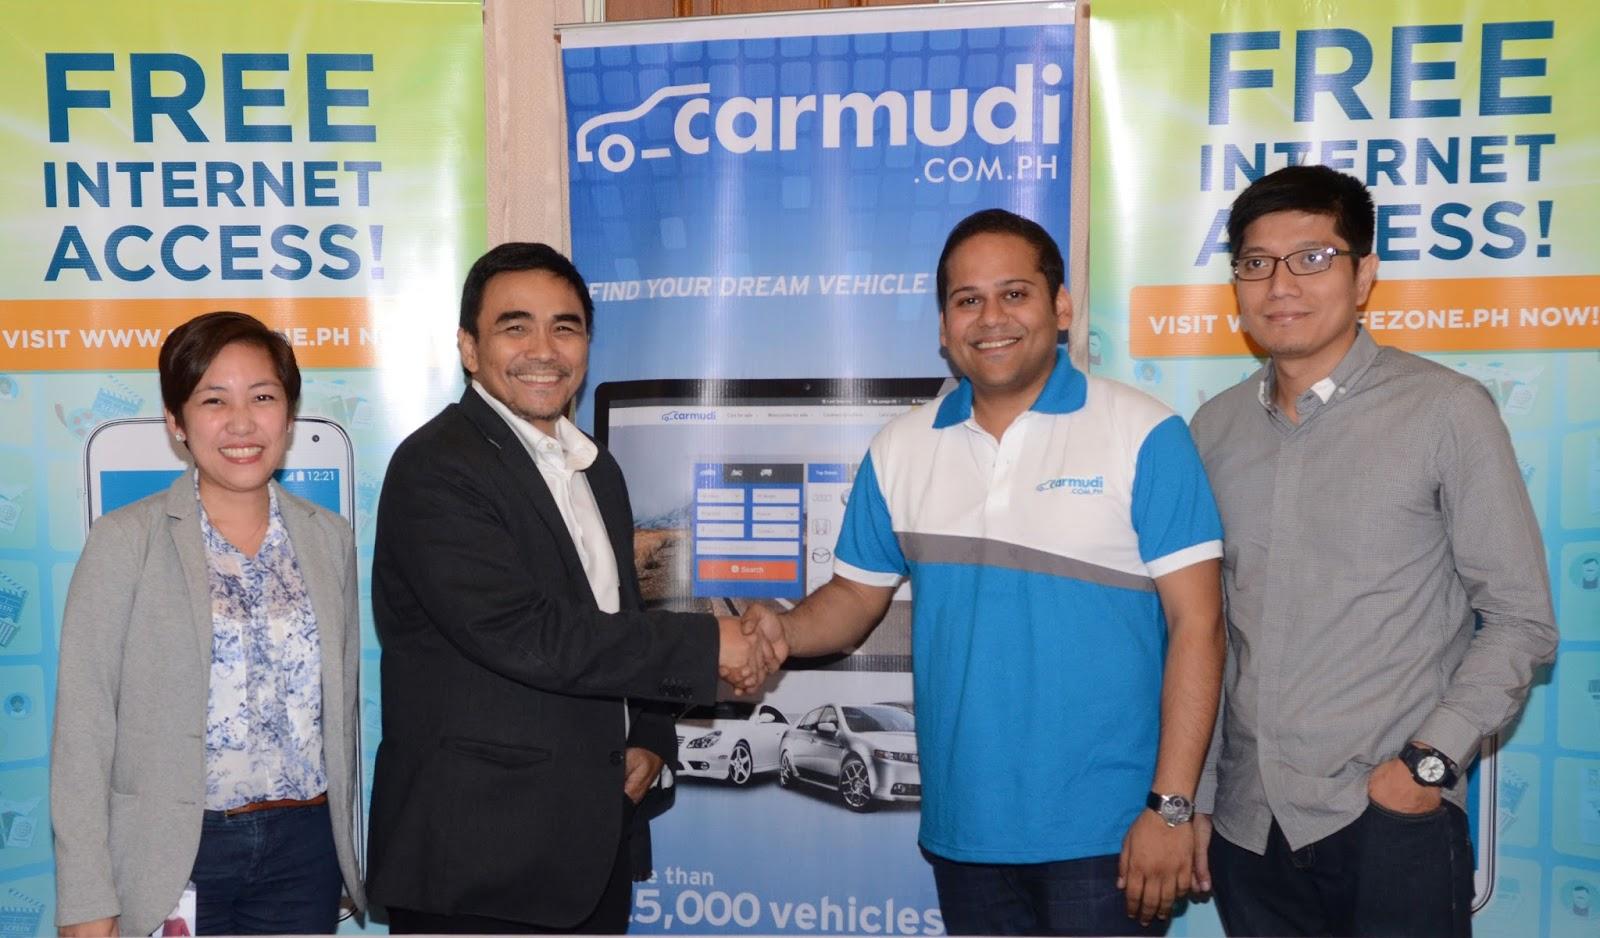 Carmudi partners with SafeZone